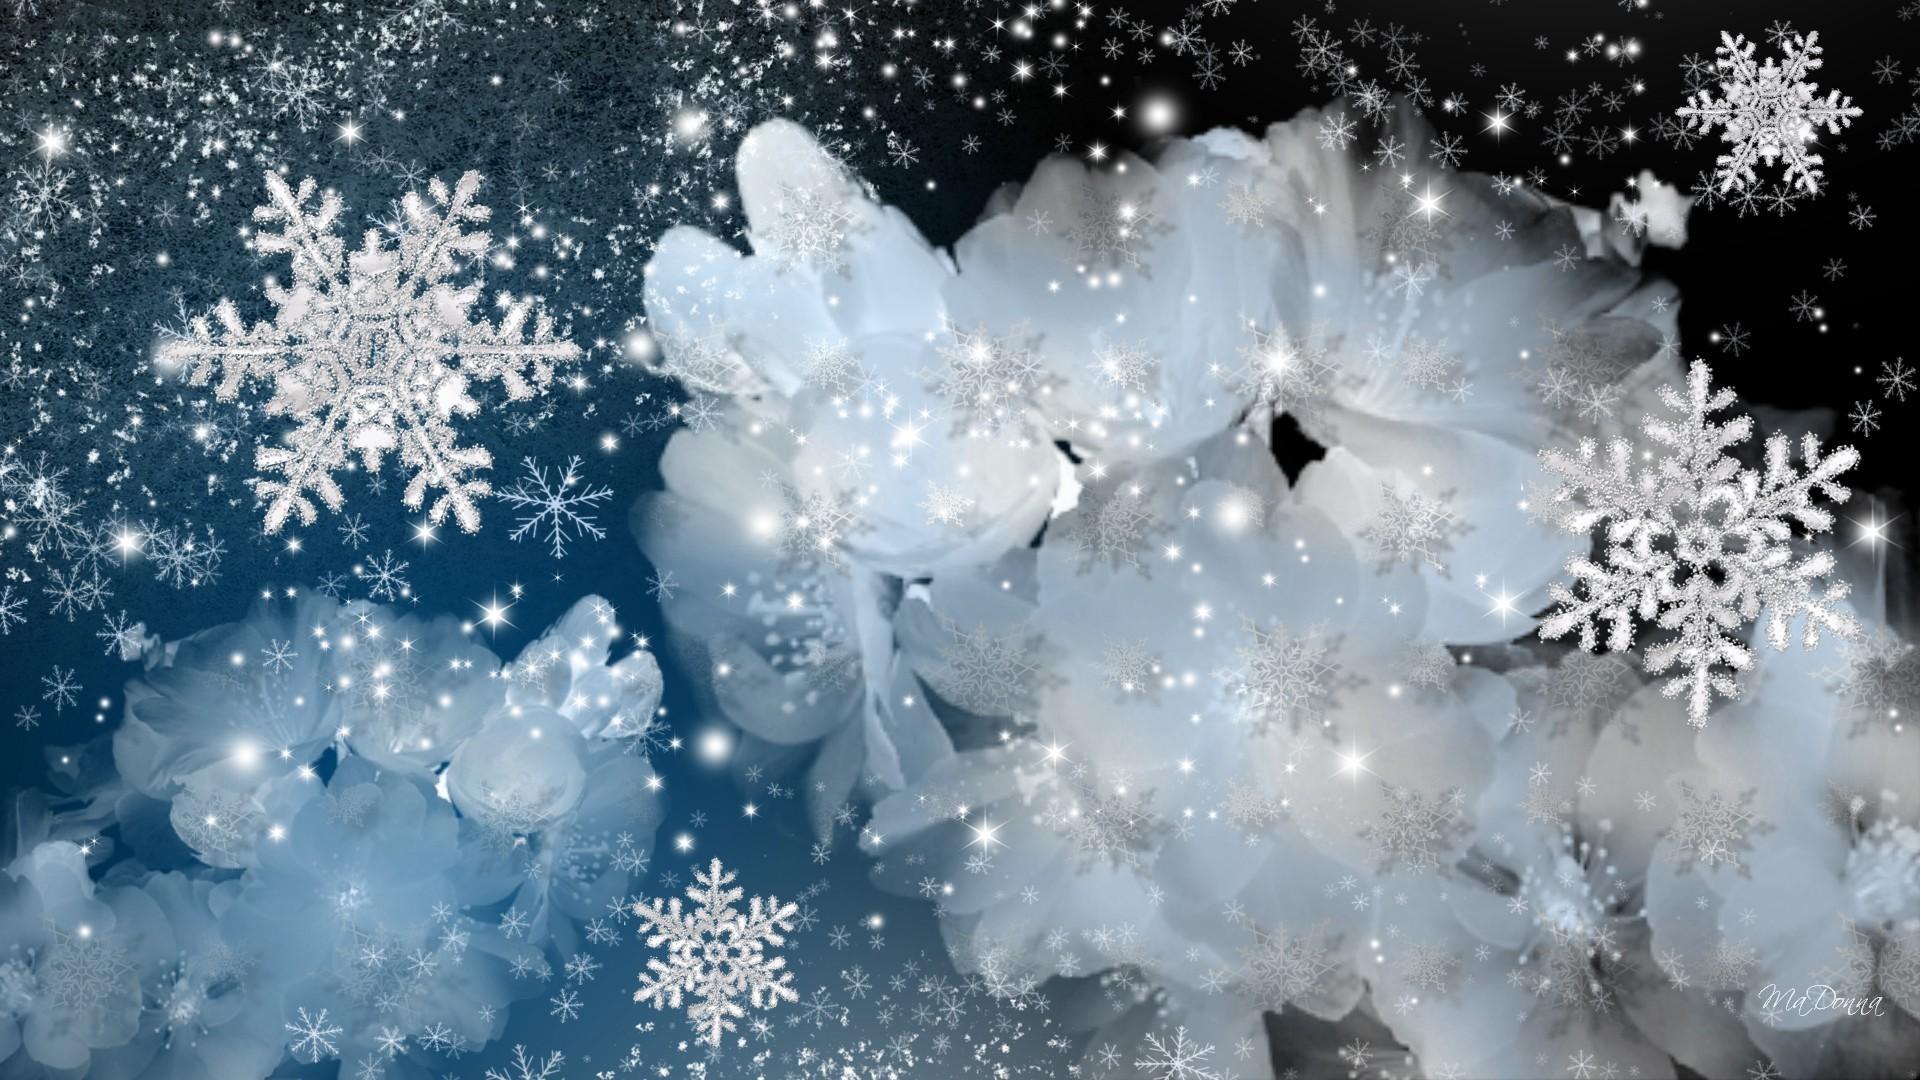 Flowers – Seasons Winter Spring Snow Blossoms Persona Blue Flowers Sakura  Snowflakes Firefox Cherry Apple Change